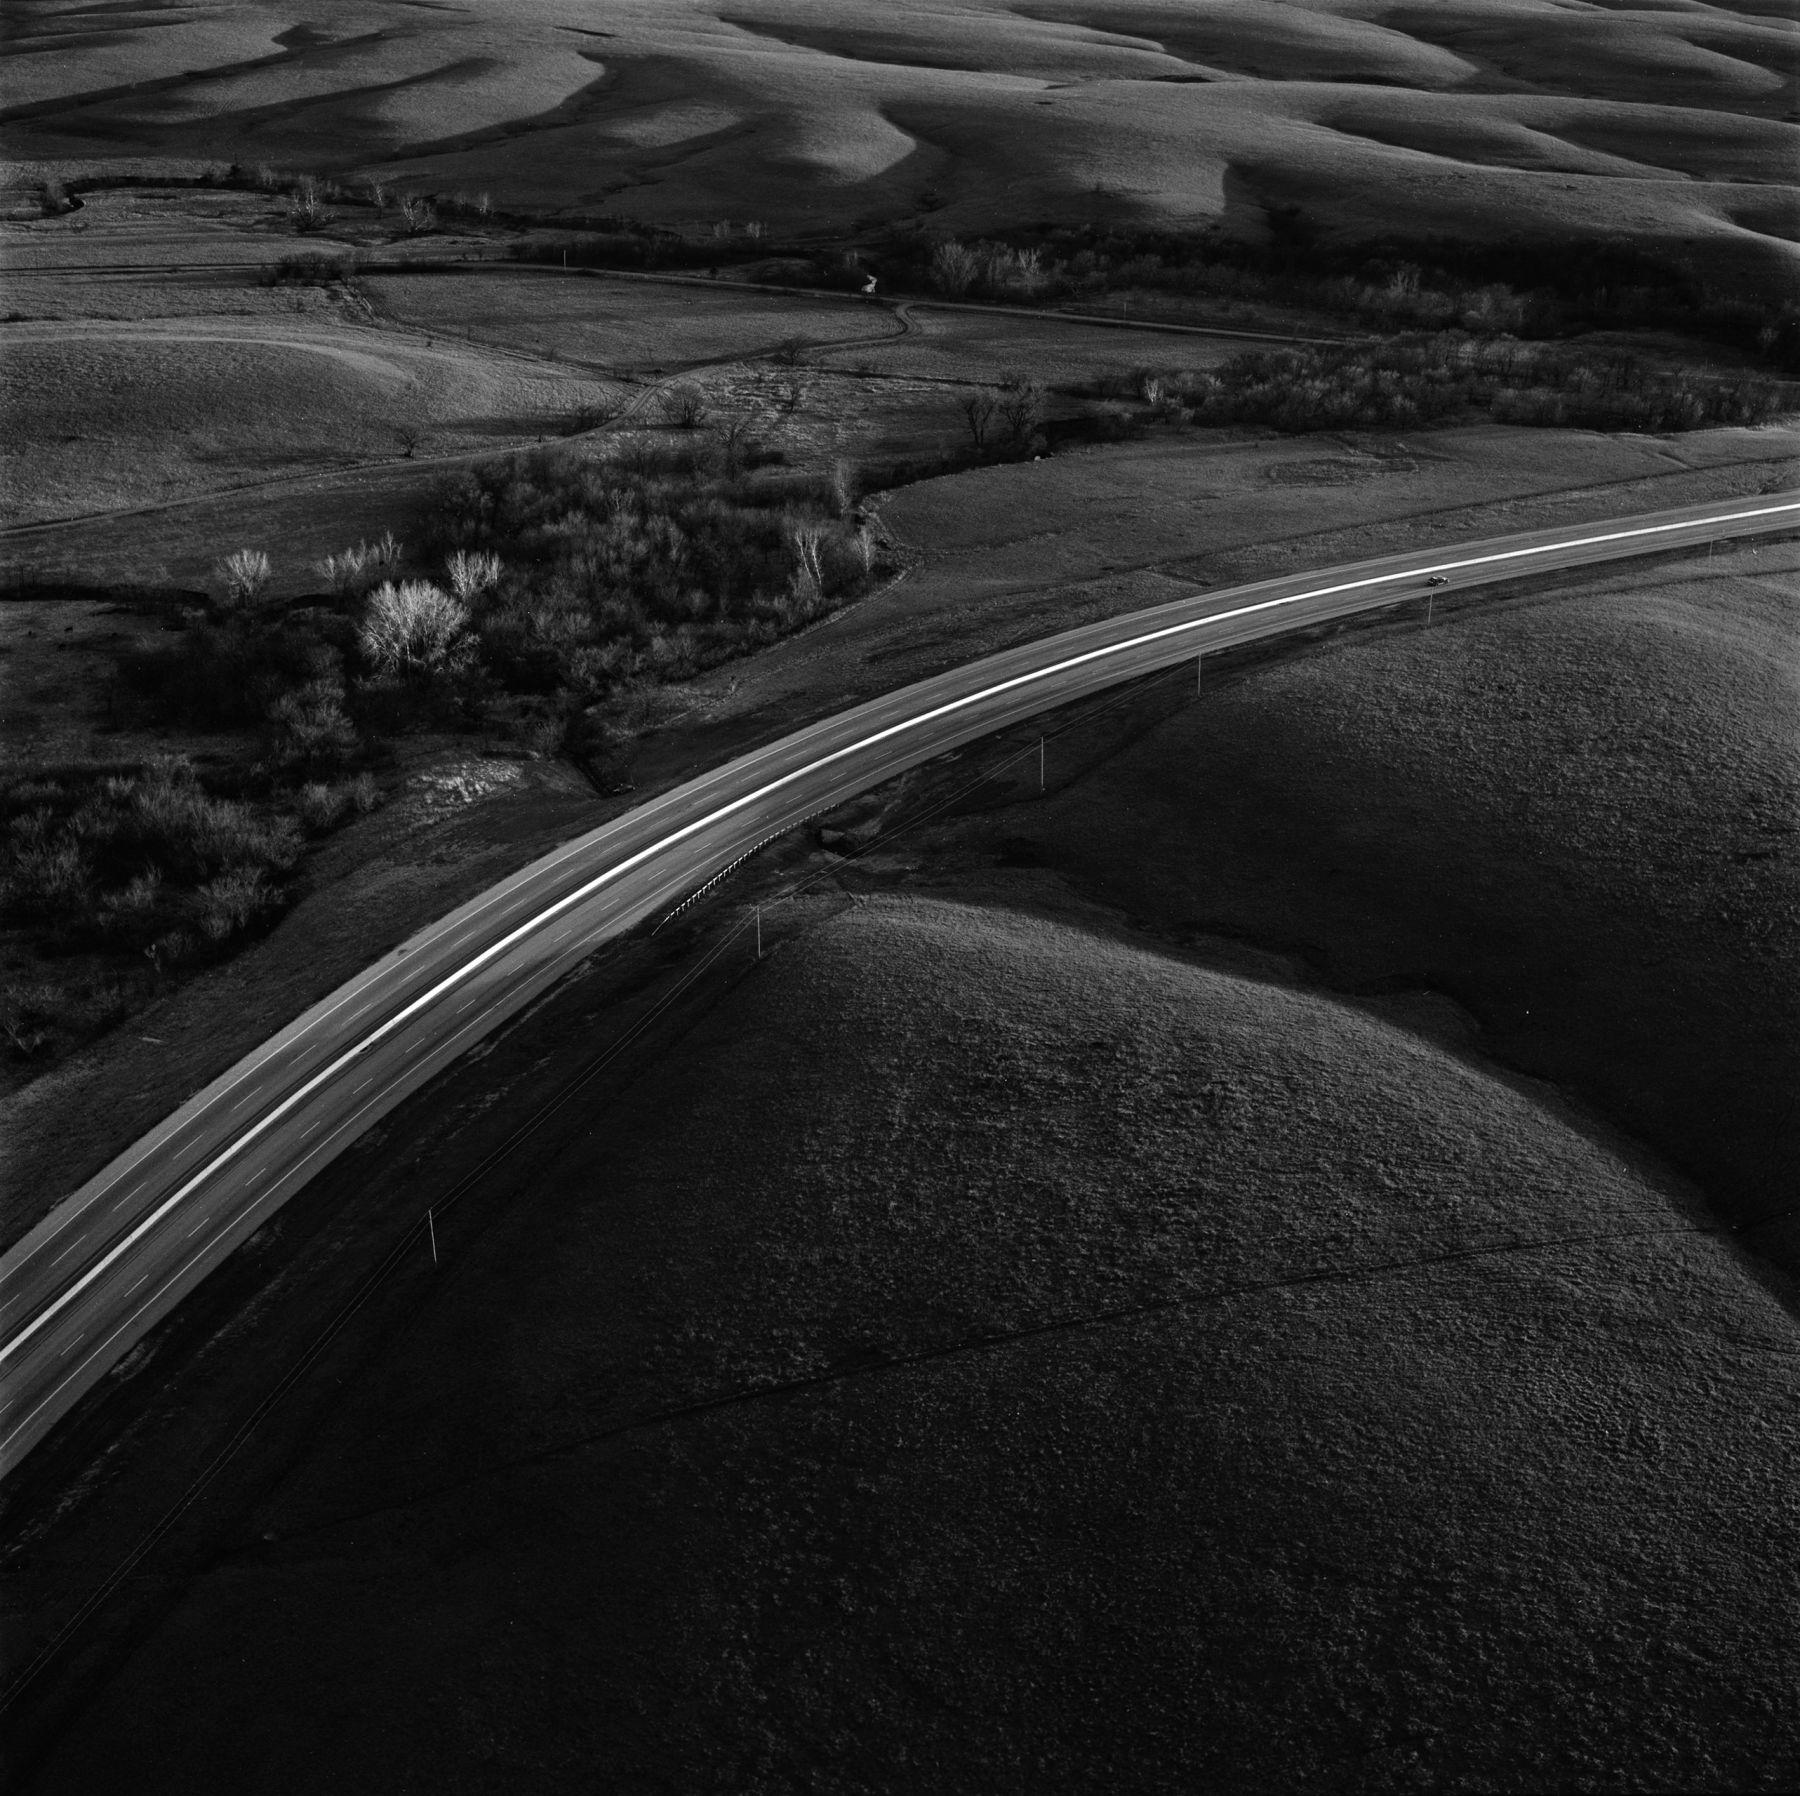 Interstate-35 Intersecting the Flint Hills, Kansas, April,1994,30 x 30 inch archival pigment print